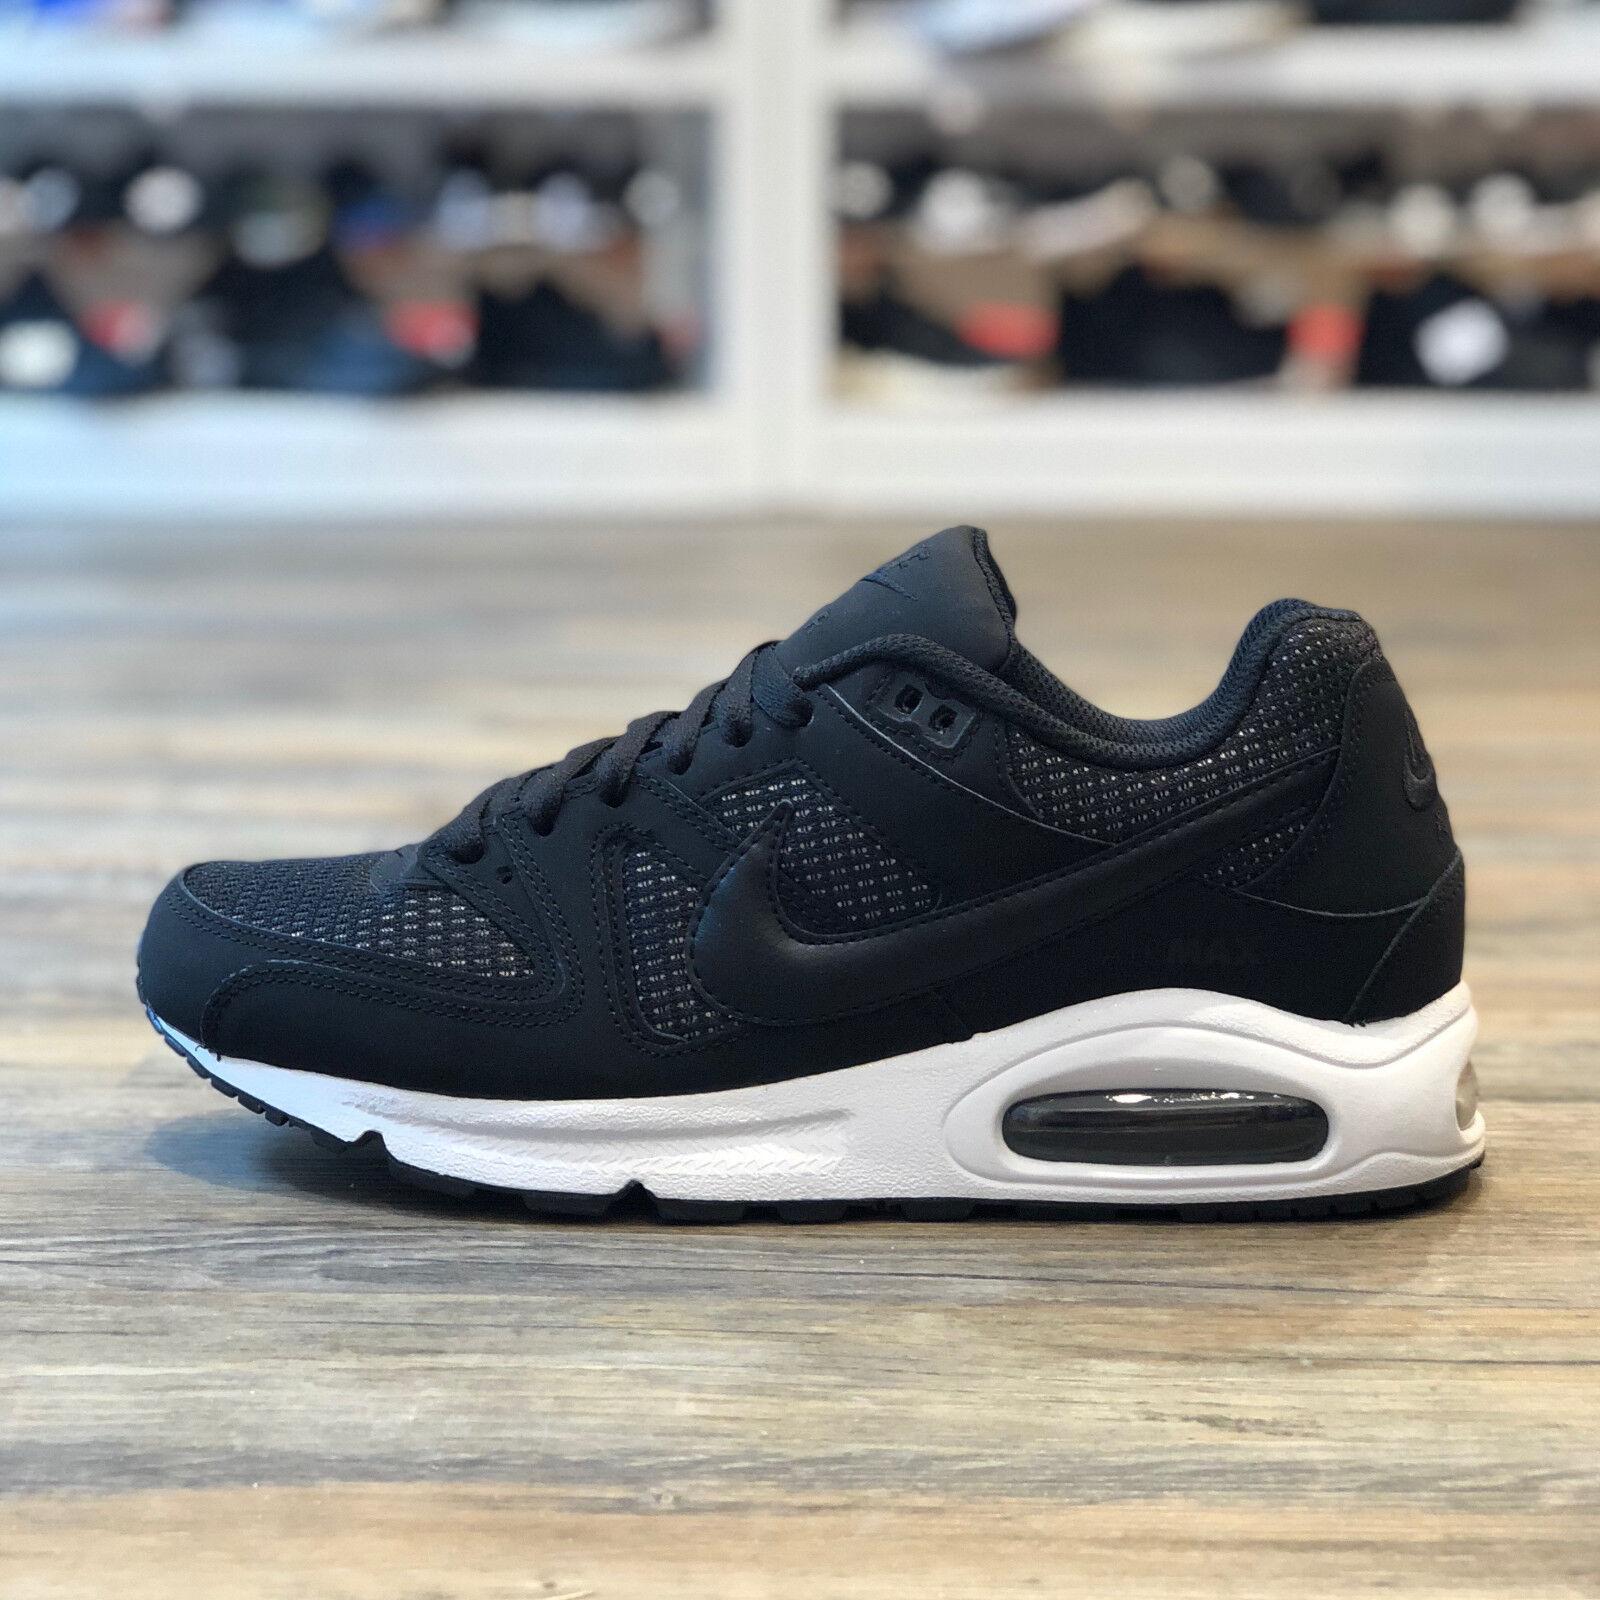 Gr 43 Schuhe Max Sneaker weiß Nike Air Command schwarz shoes